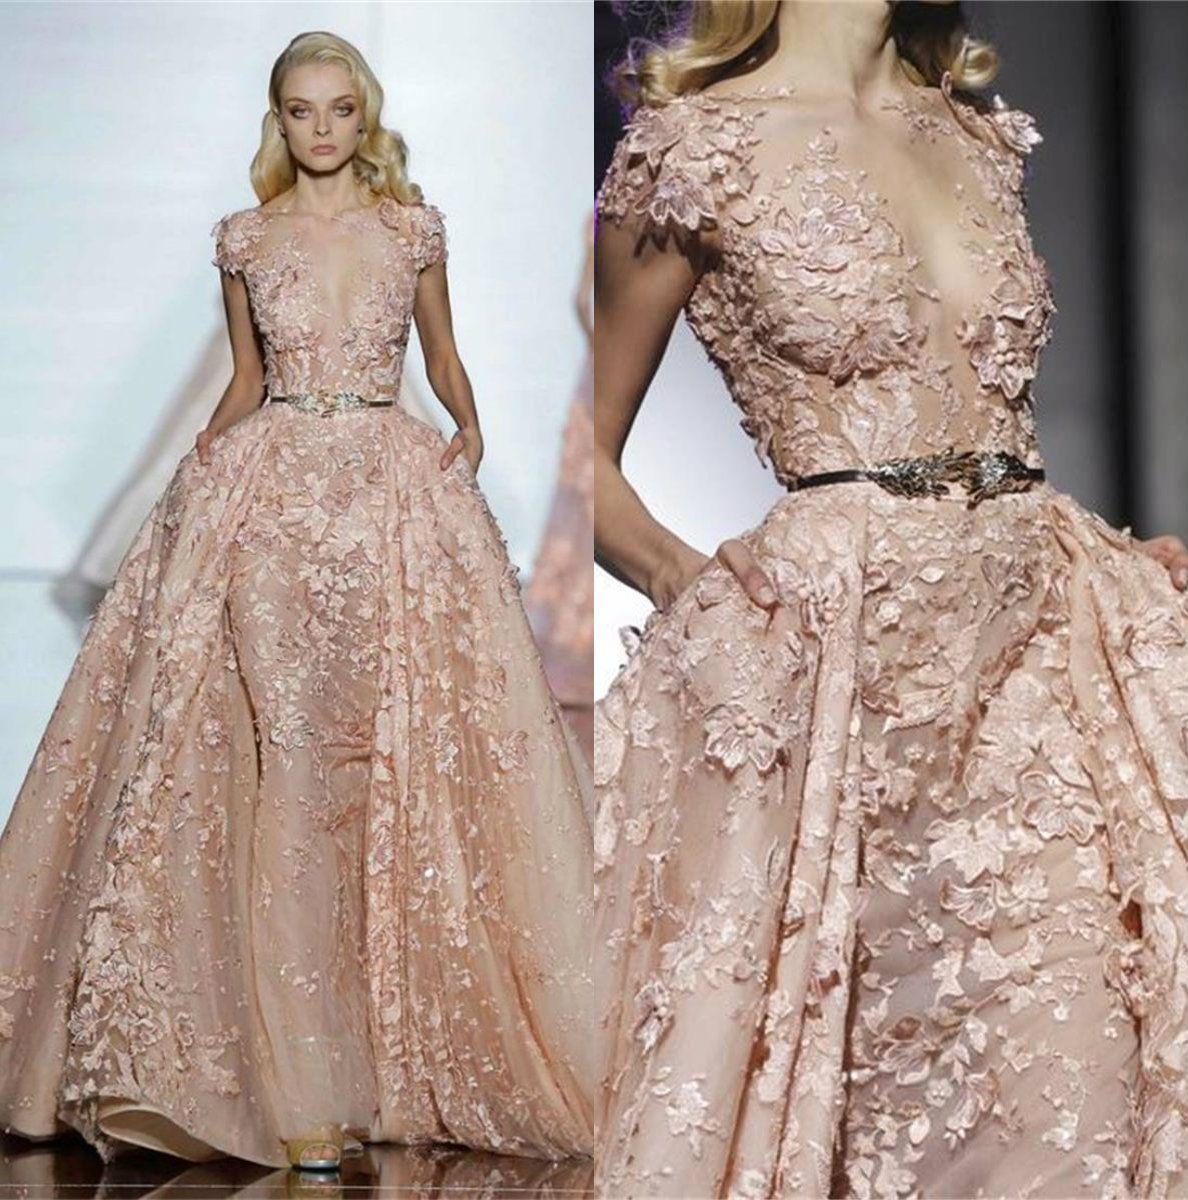 2cf4d9991 Compre Zuhair Murad Elegante Blush Rosa Vestidos De Baile Con Overkskirt  Exquisito Apliques De Encaje Vestidos De Noche Fiesta Formal Desgaste Hoja  ...